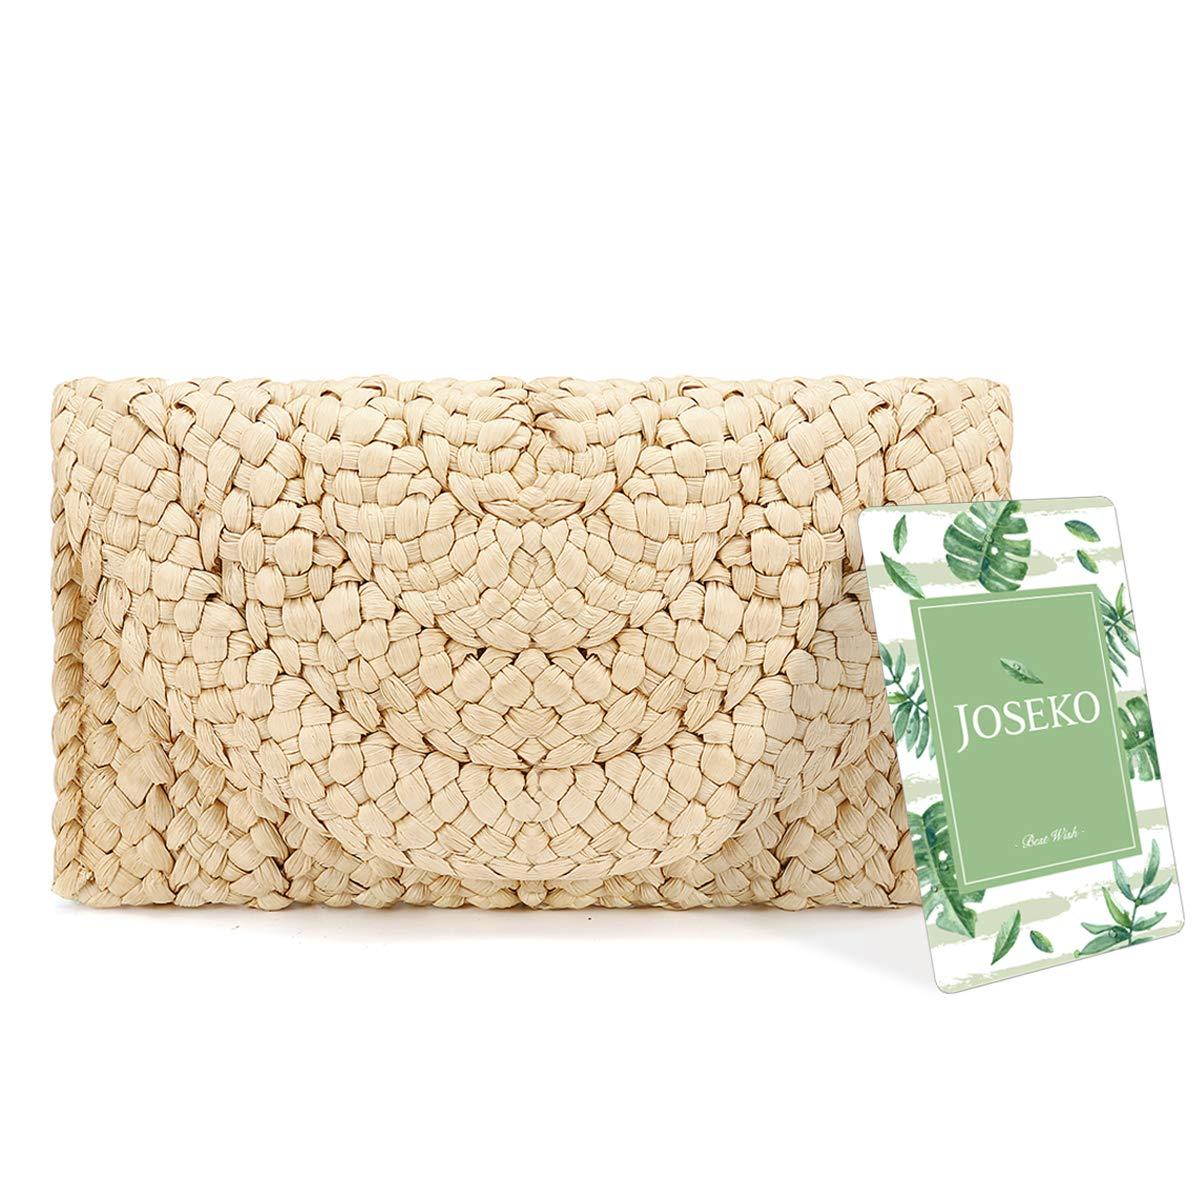 Monedero de Embrague de Paja, JOSEKO Envelope Flat Clutch Mujer Fiesta Bolso Mimbre Bolsa de